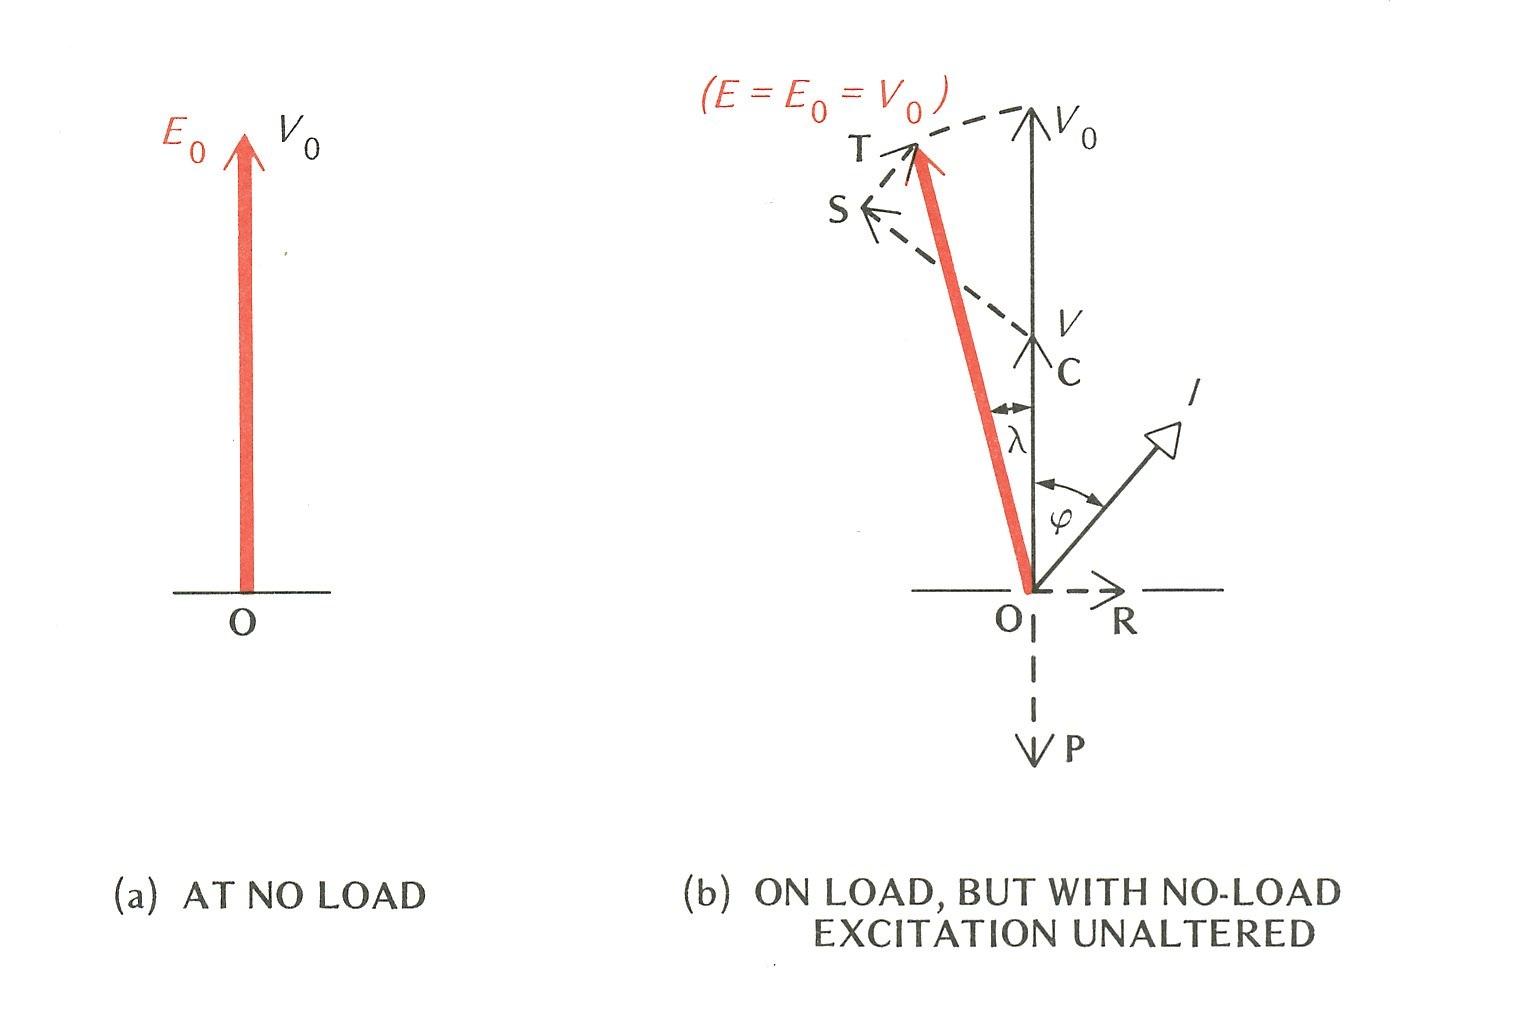 Terminal Voltage Of Generator Measurement Three Phase Power Electrical4u